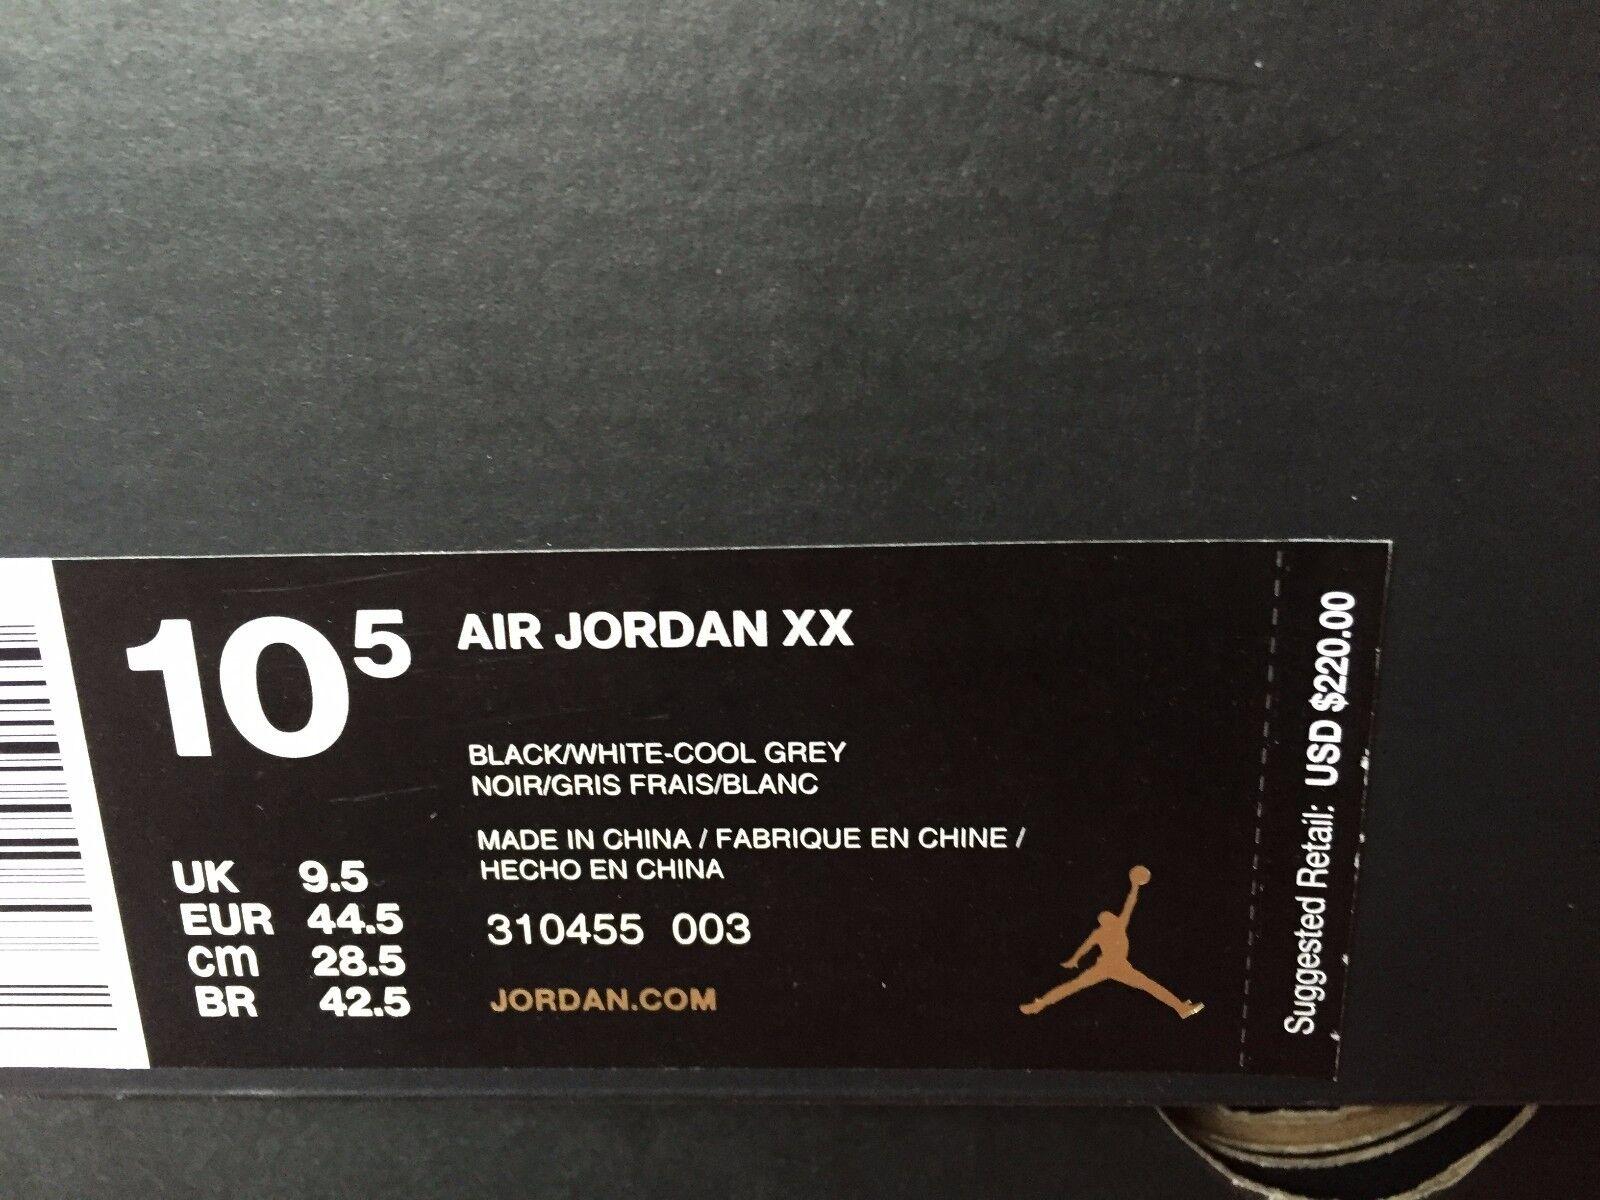 Nike air jordan 20 xx oreo sz grey 10,5 bianco nero fico grey sz wing 310455-003 playoff 18b9e1